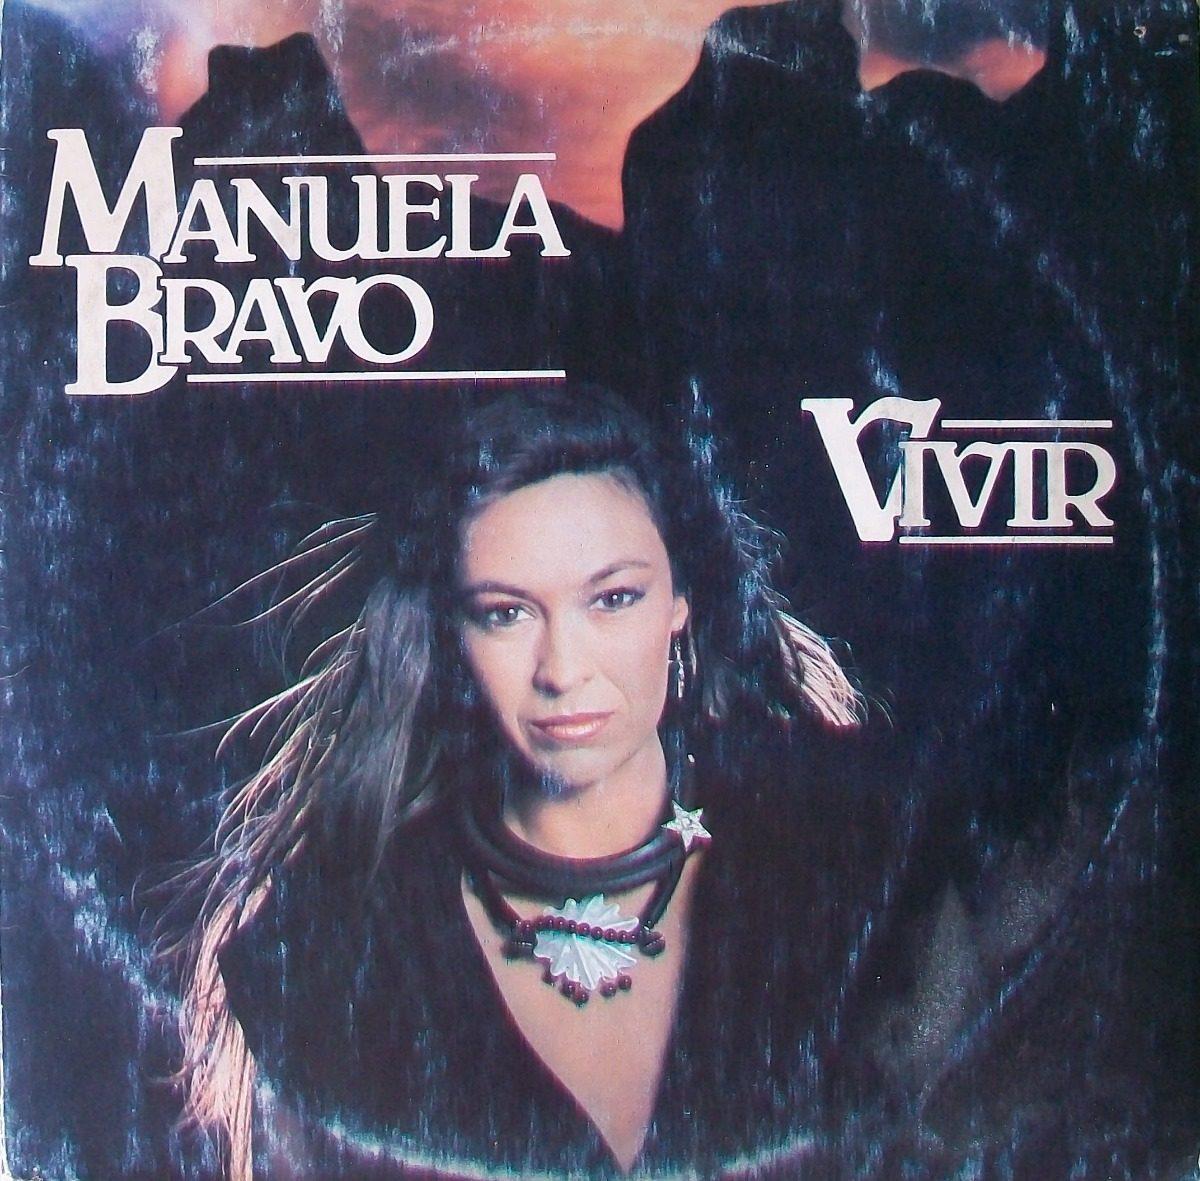 ee788639ce5aa Manuela Bravo - Vivir Disco Vinilo Lp -   243,00 en Mercado Libre